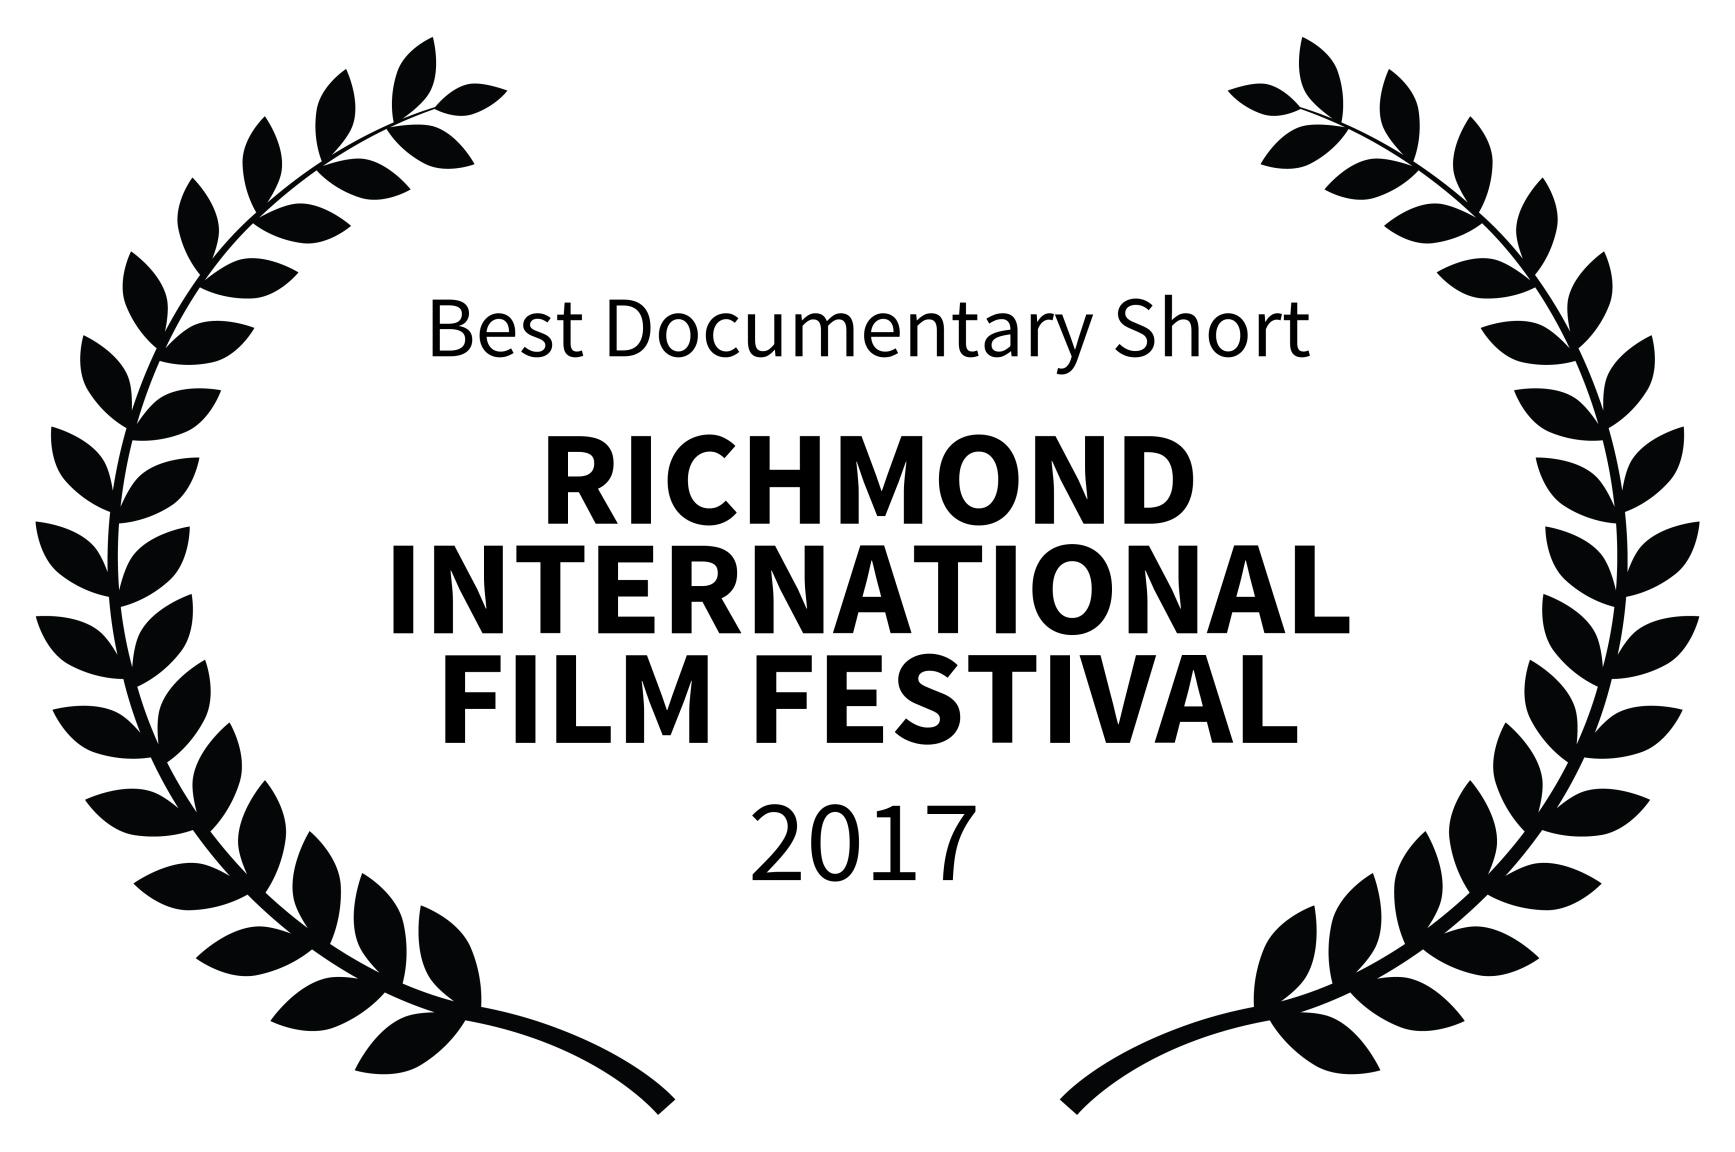 Best Documentary Short - RICHMOND INTERNATIONAL FILM FESTIVAL - 2017.jpg